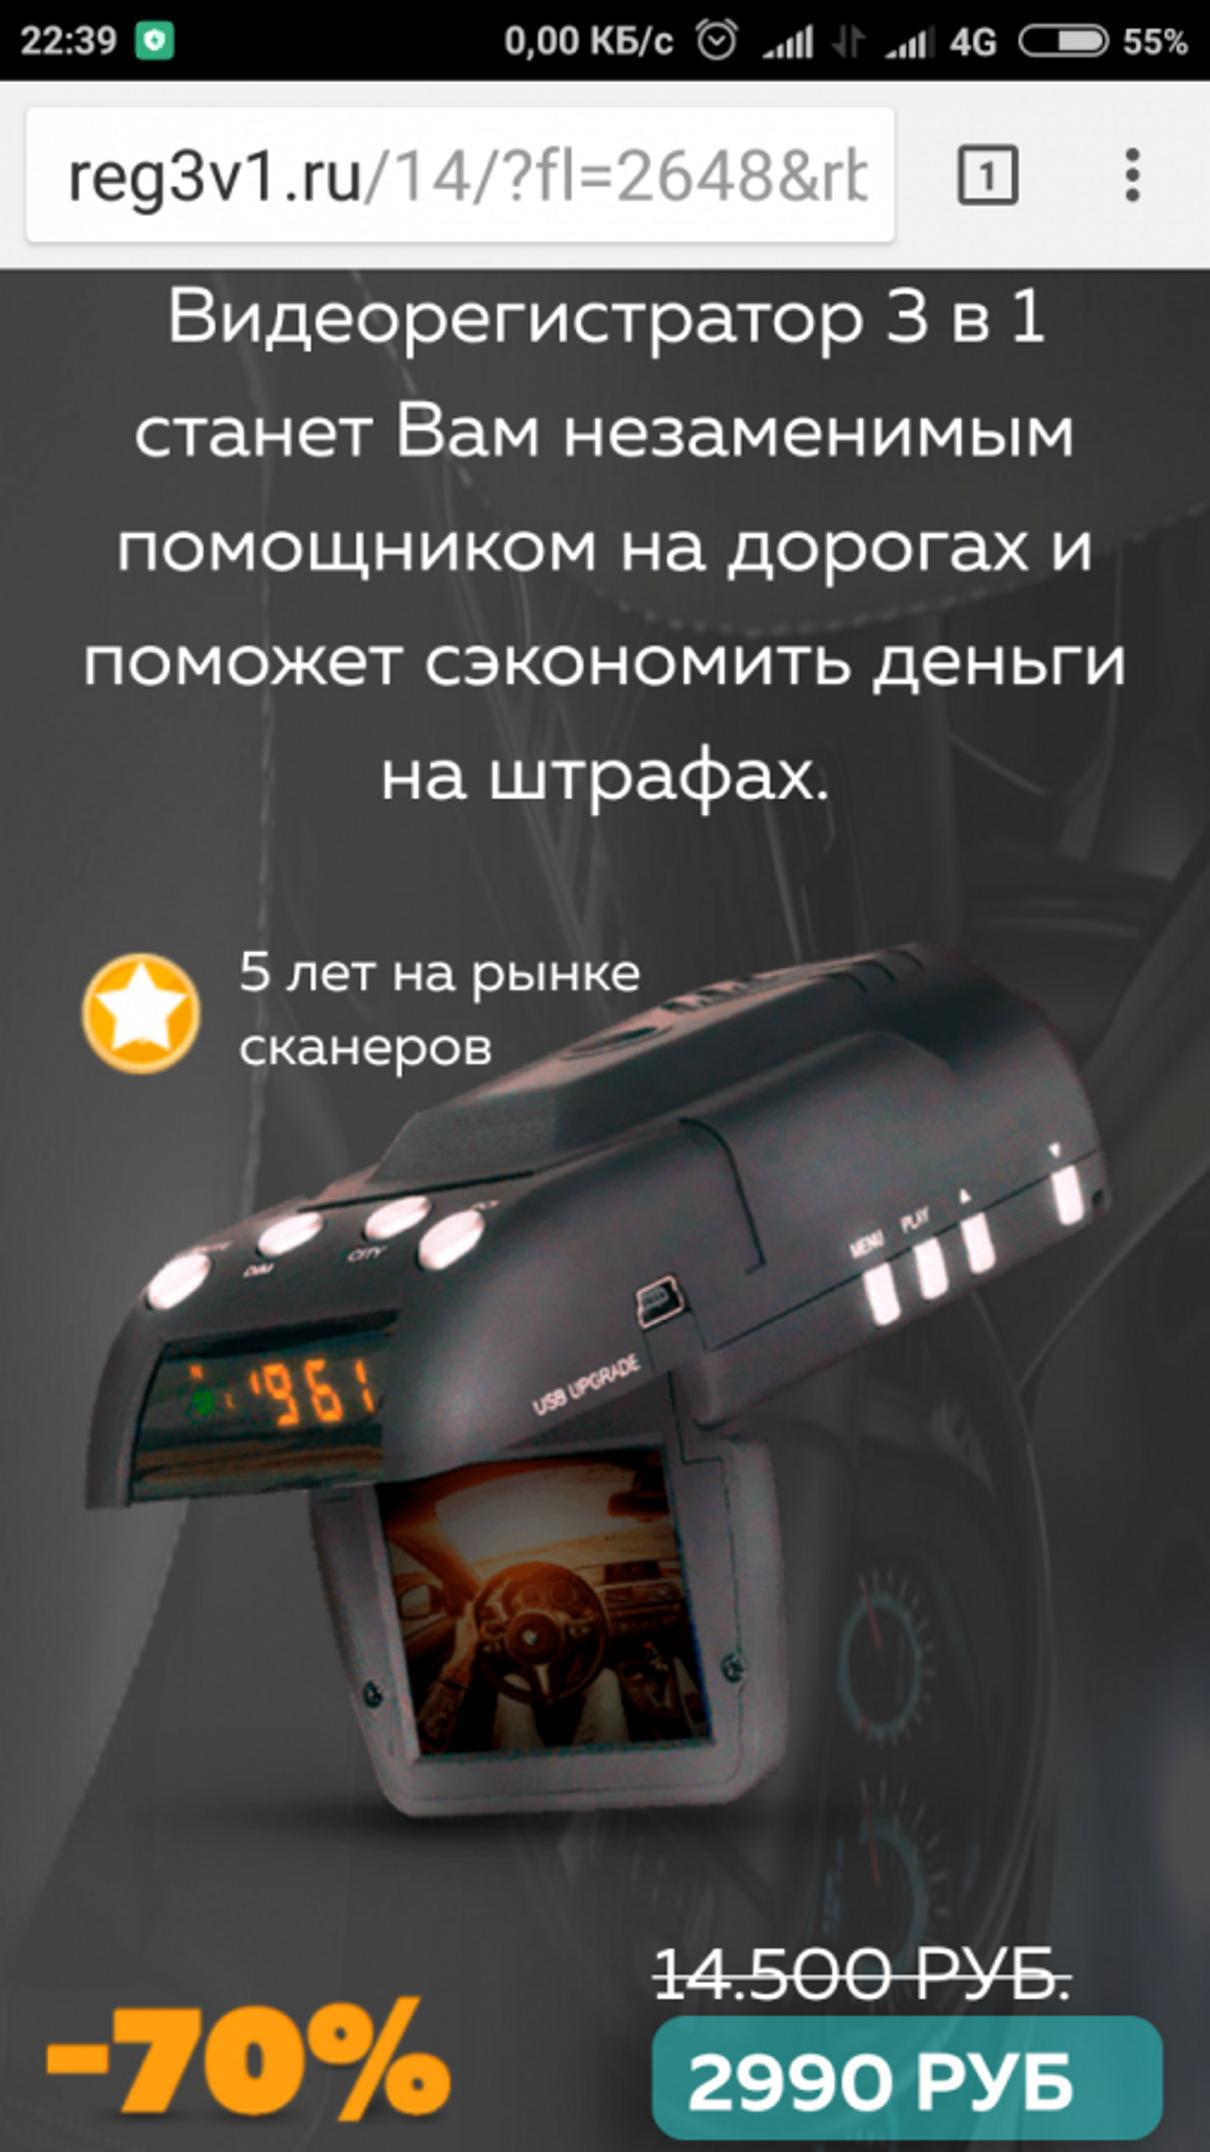 Жалоба-отзыв: Support@ooo-opportunity.ru - Несоответствие товара